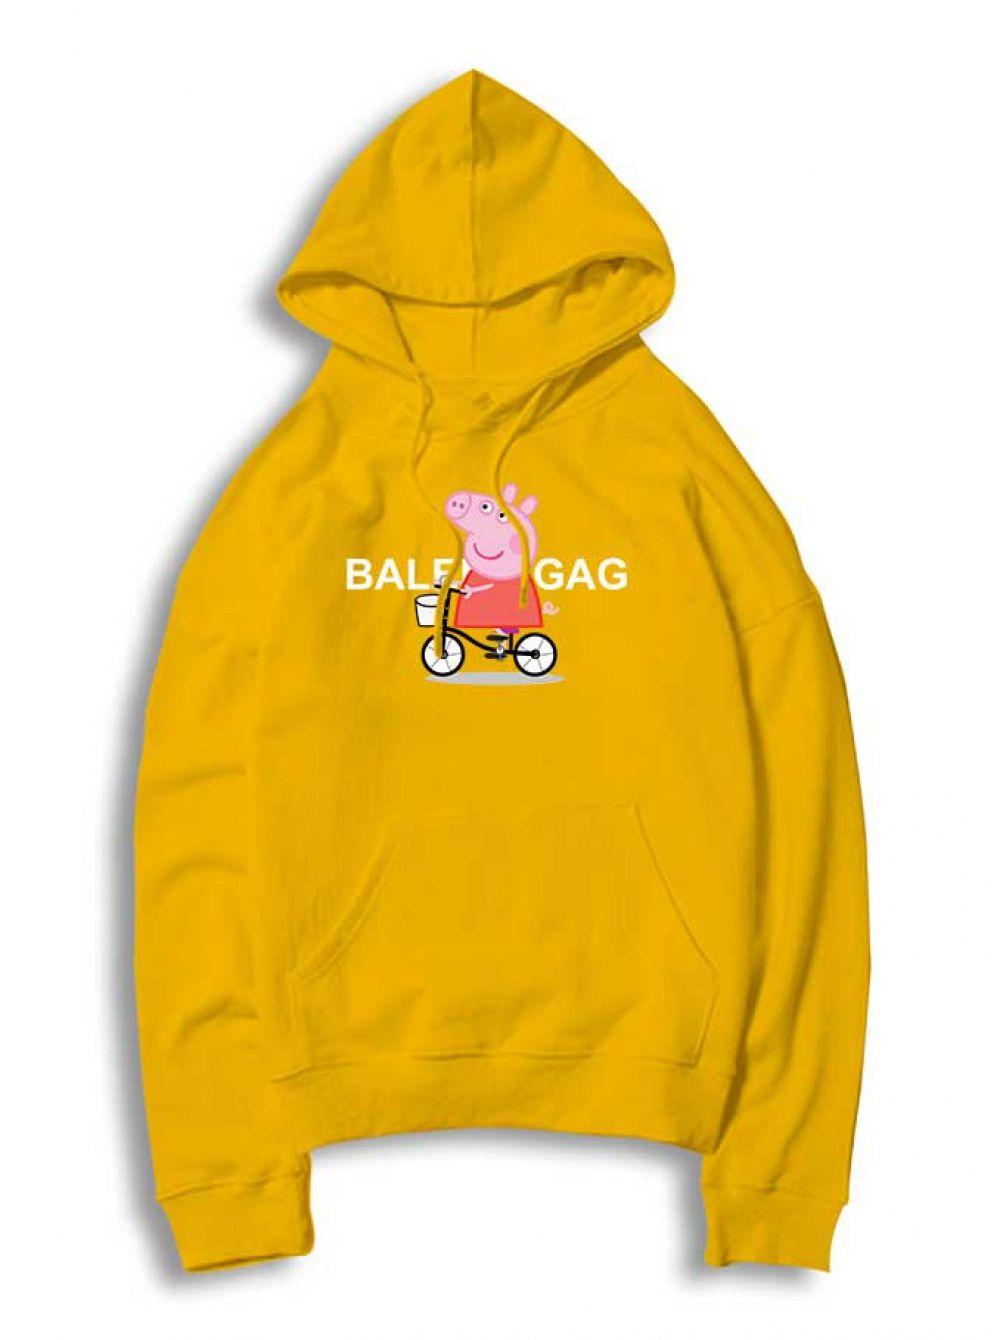 29e5905f2471 Peppa Pig X Balenciaga Parody Hoodie $ 33.50 #Tee #Hype #Outfits #Outfit  #Hypebeast #fashion #shirt #Tees #Tops #Teen